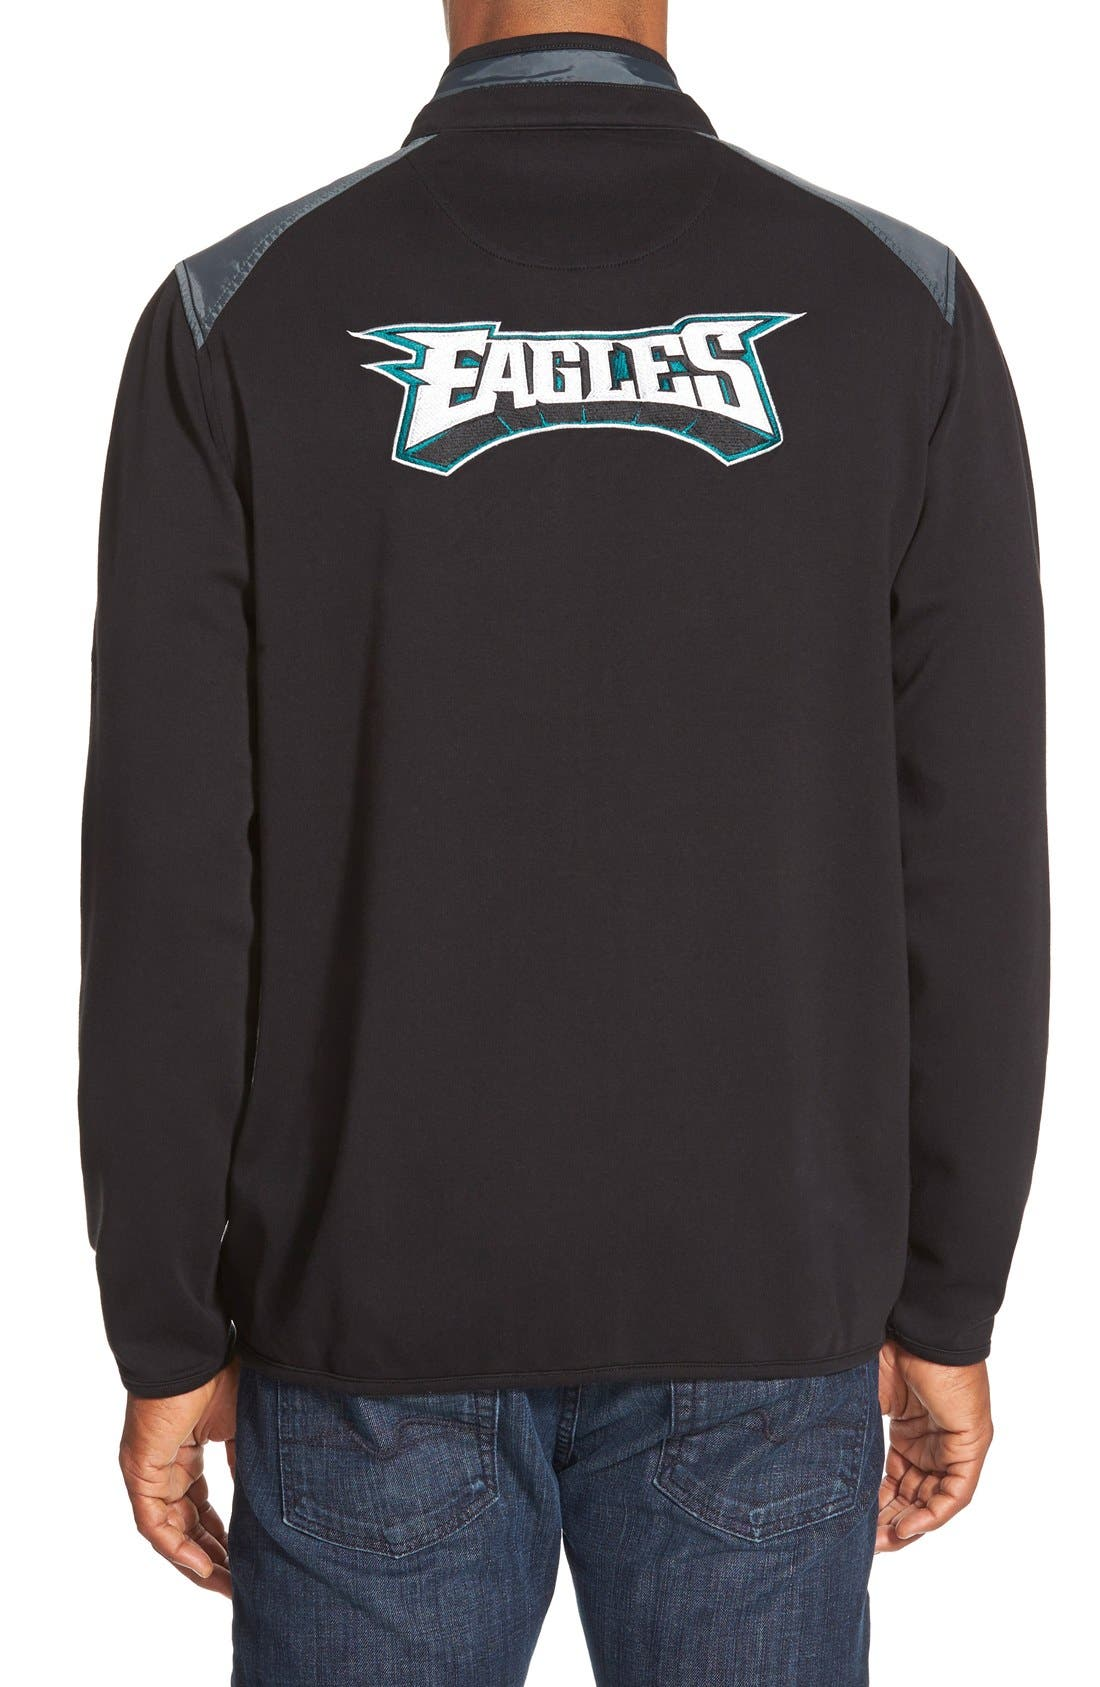 TOMMY BAHAMA,                             'Goal Line - Baltimore Ravens' NFL Full Zip Jacket,                             Alternate thumbnail 3, color,                             001